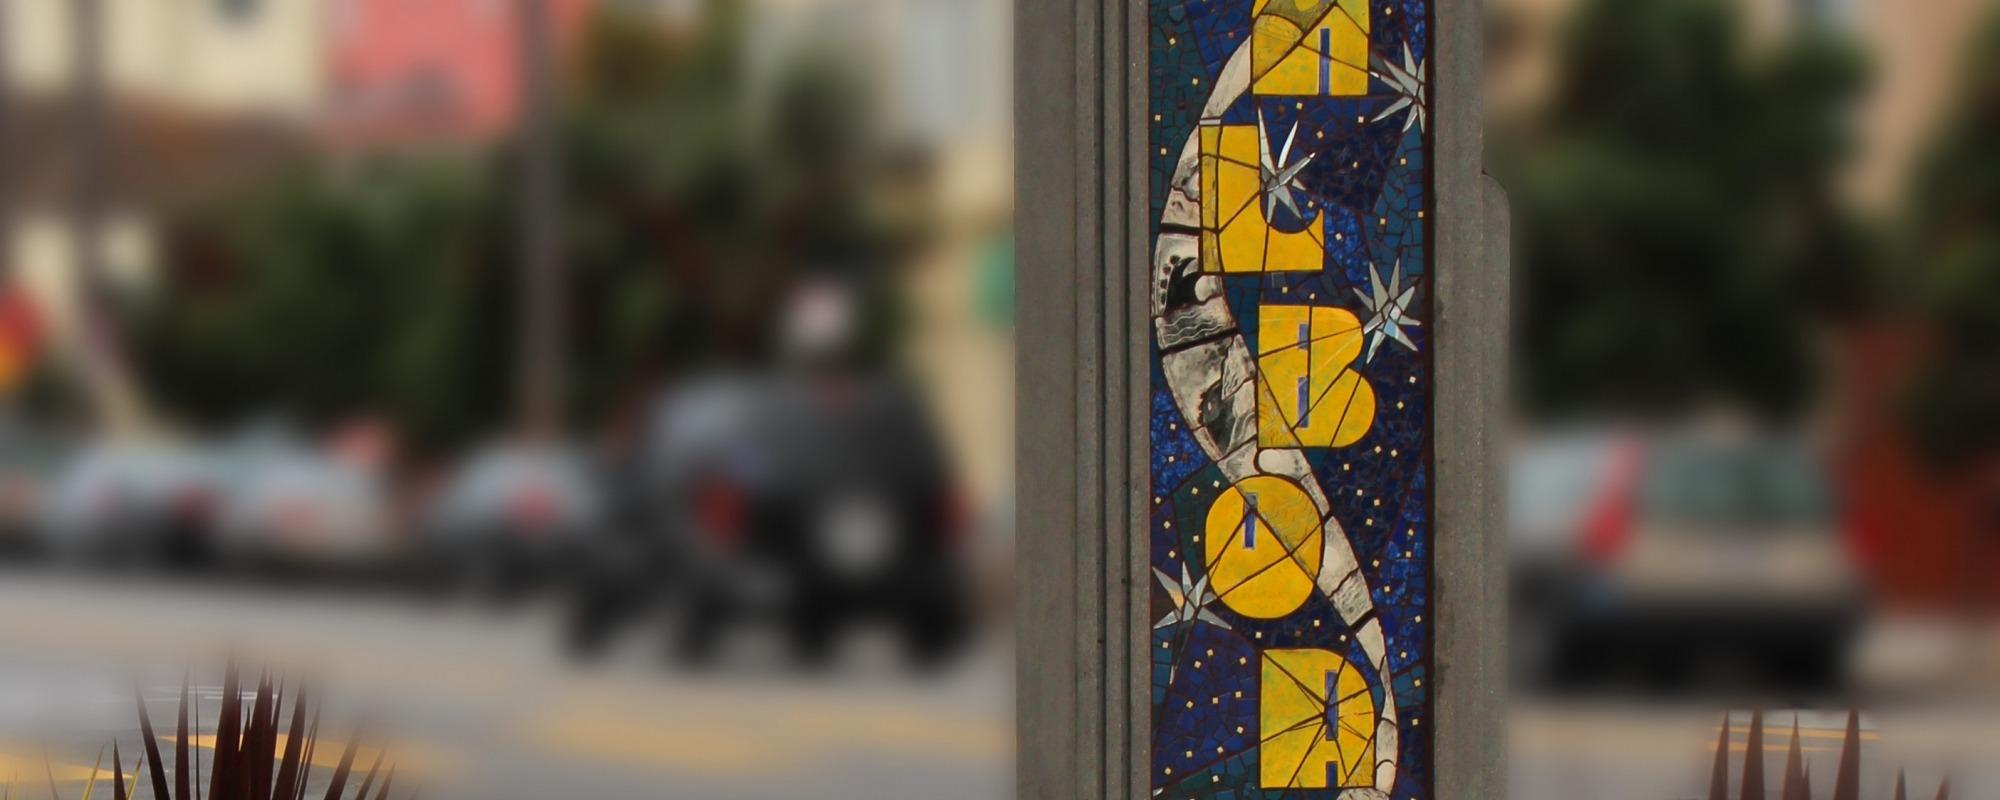 Balboa Streetscape Improvements